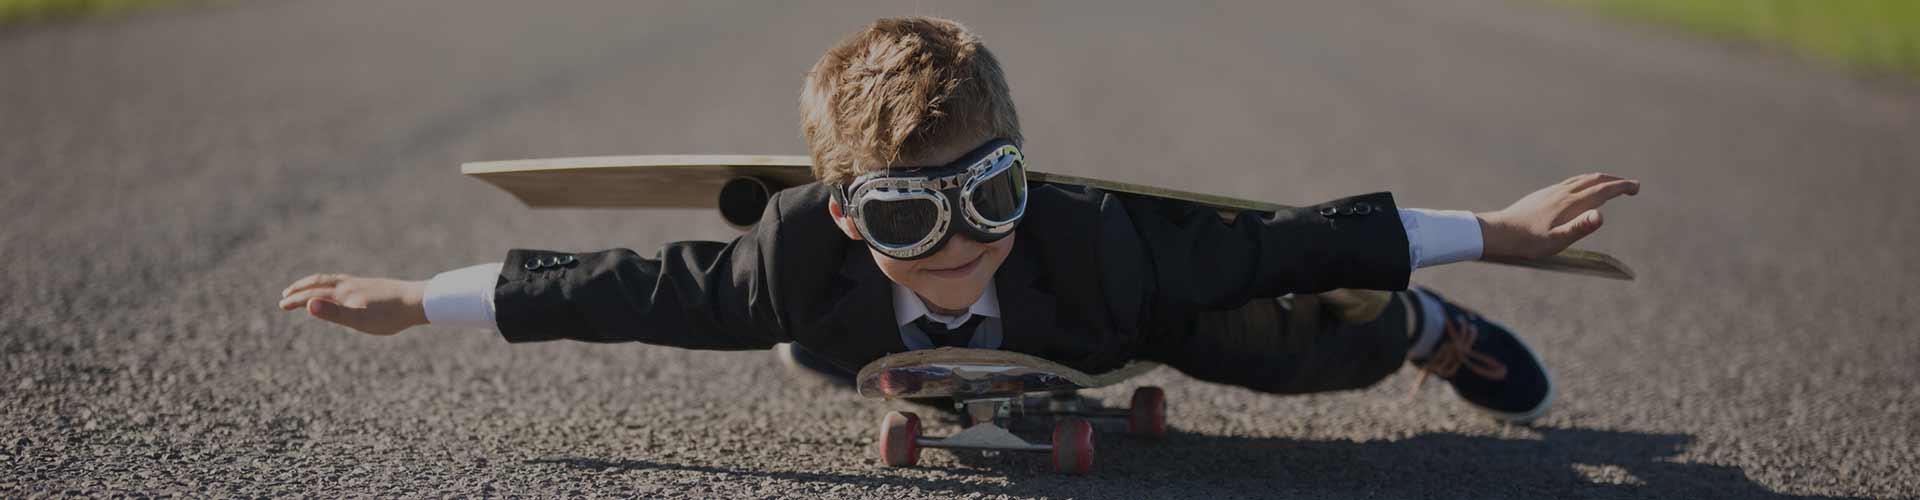 kid flying on a skateboard